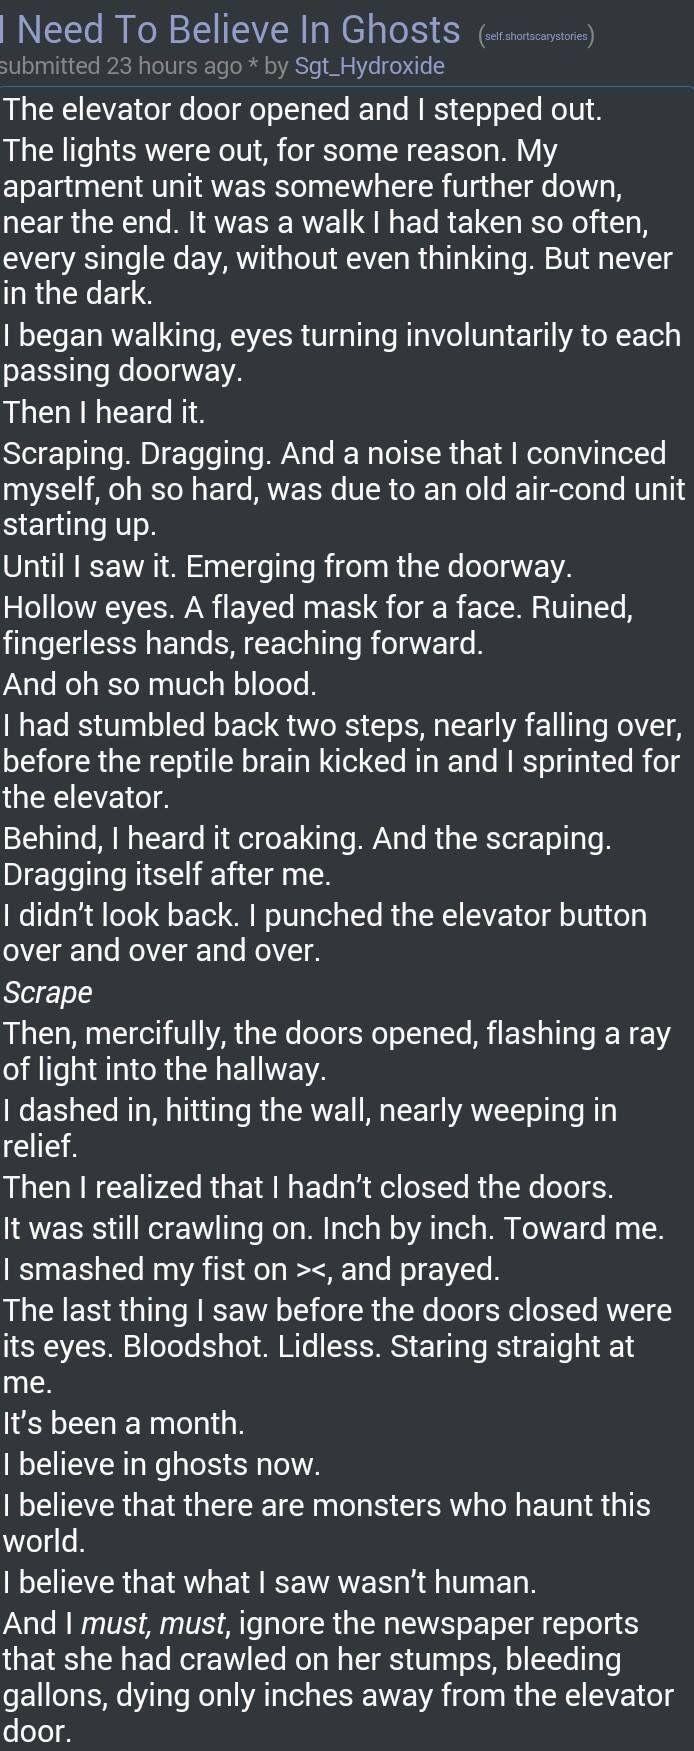 Remarkable, creepypasta sex stories